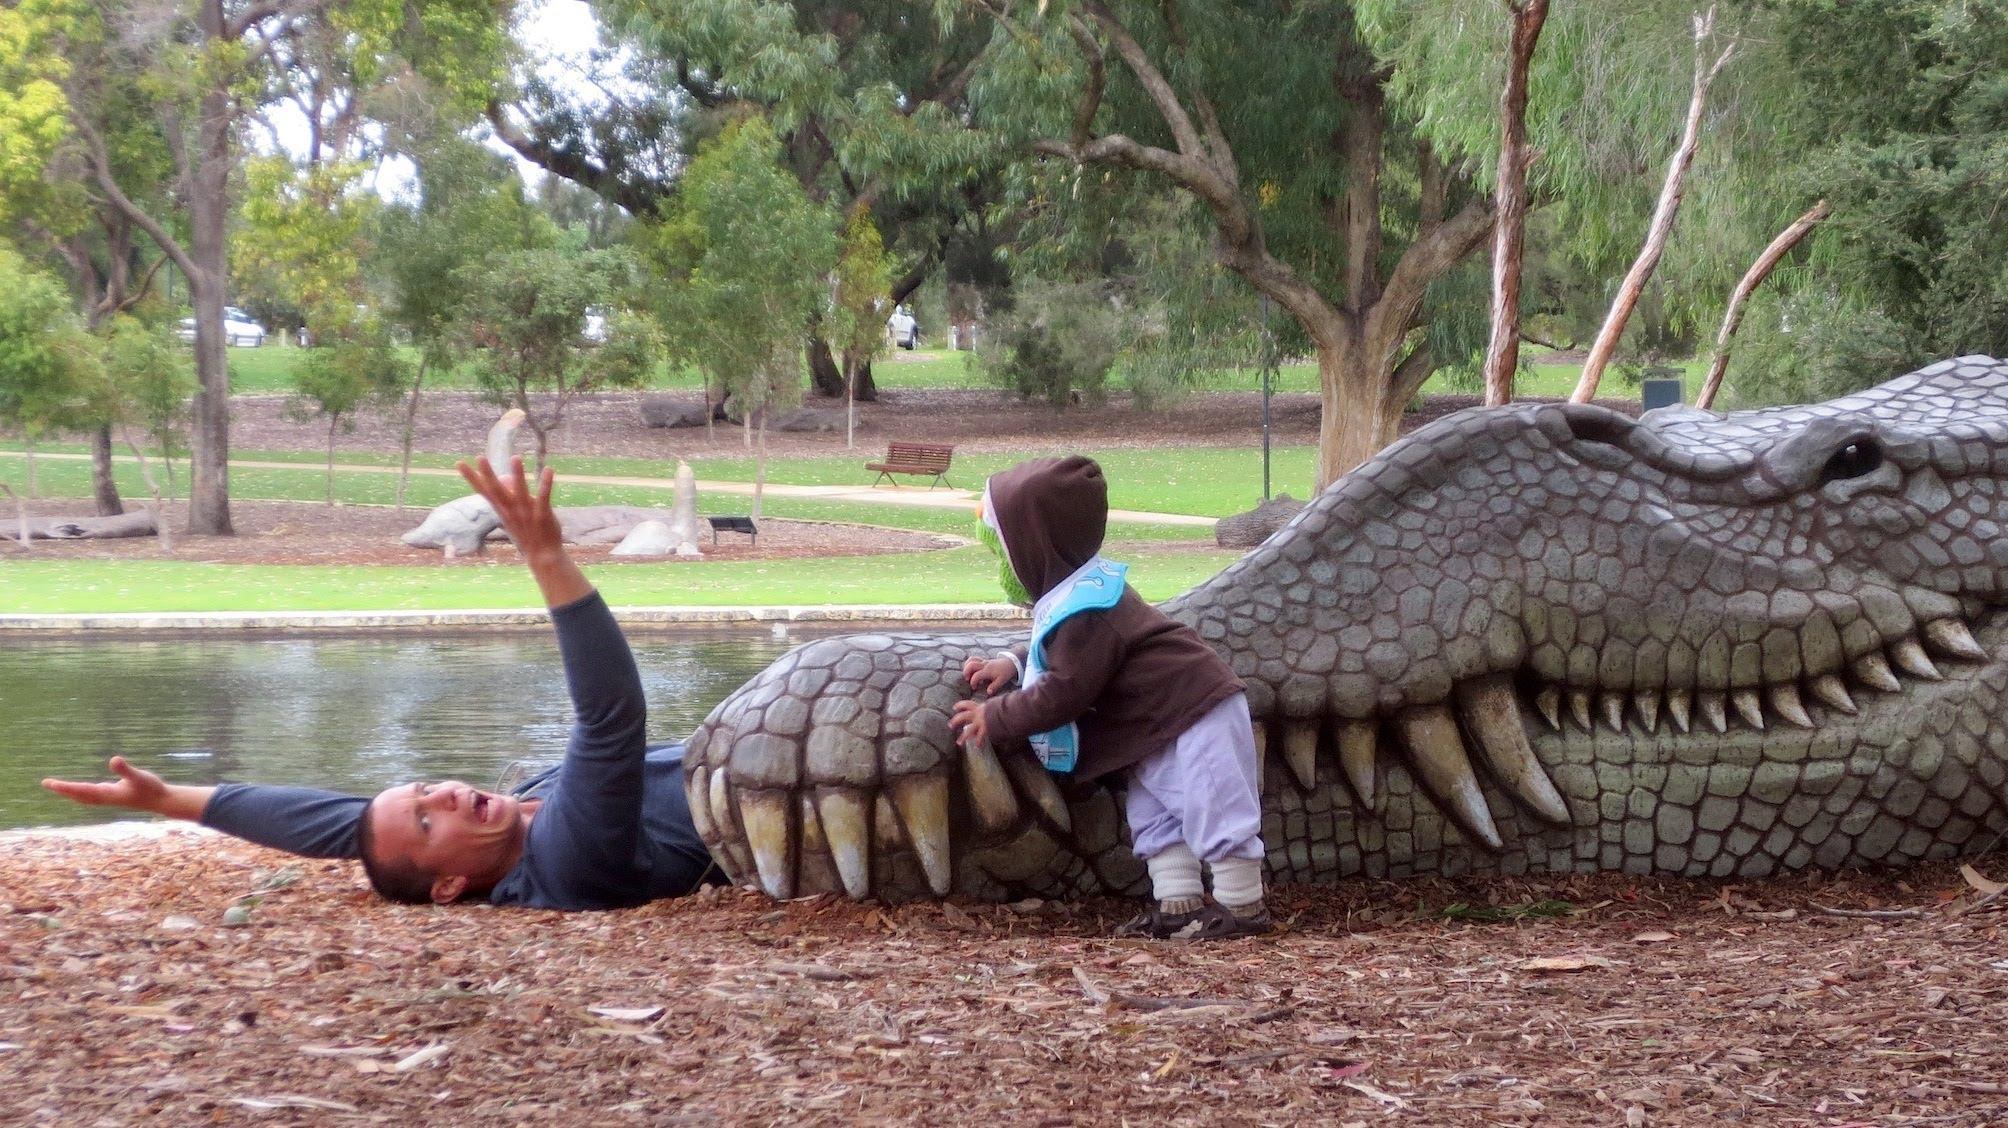 Man killed By Crocodile - The Glitters Online